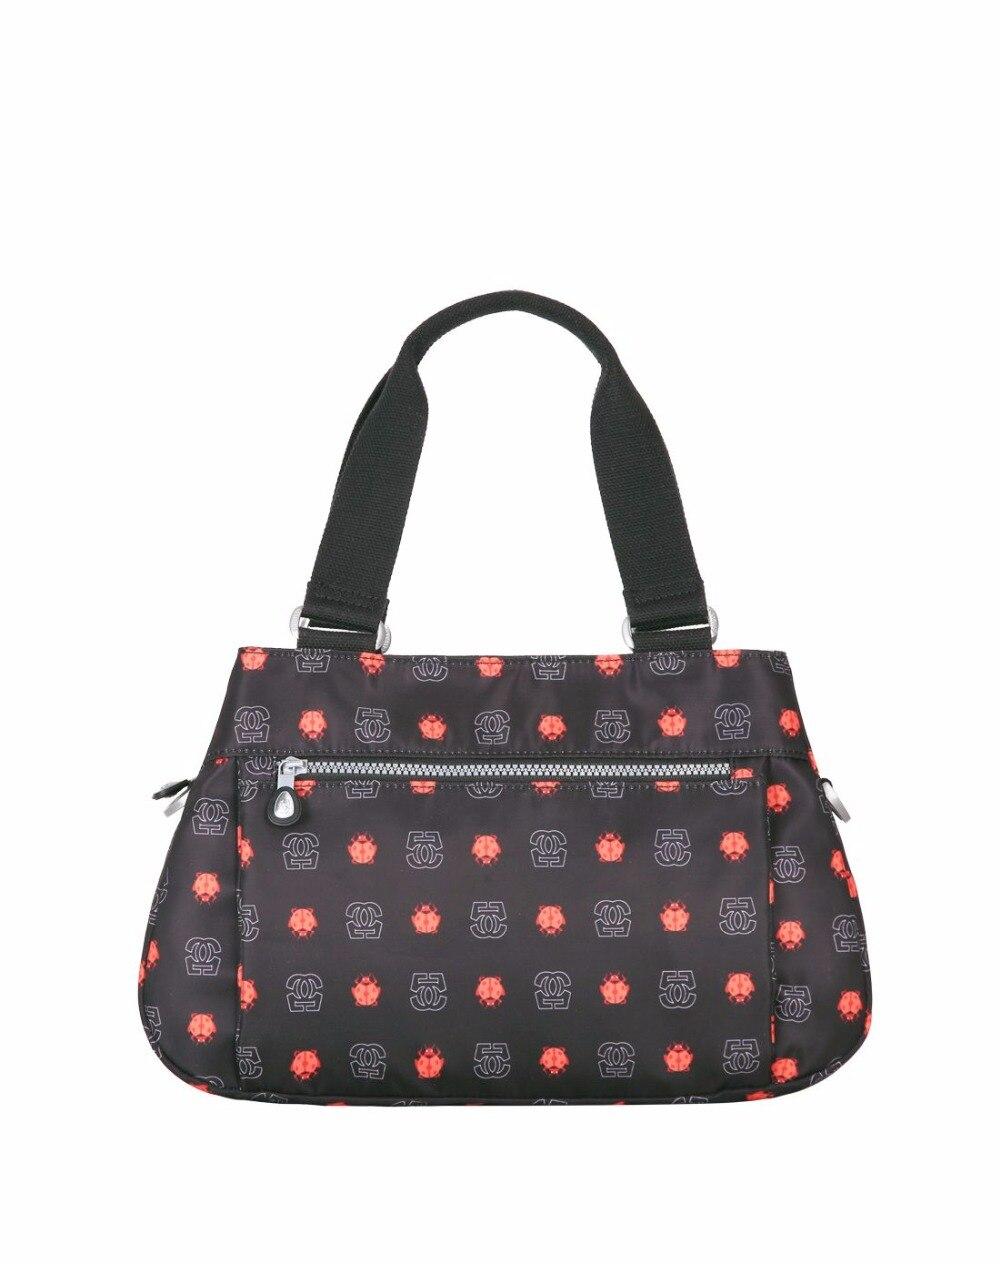 ФОТО Germano Hot Sale Women Totes Fashion Nylon Logo Printing Handbags Casual New Kip Single Shoulder Bags Leisure Bags For Women